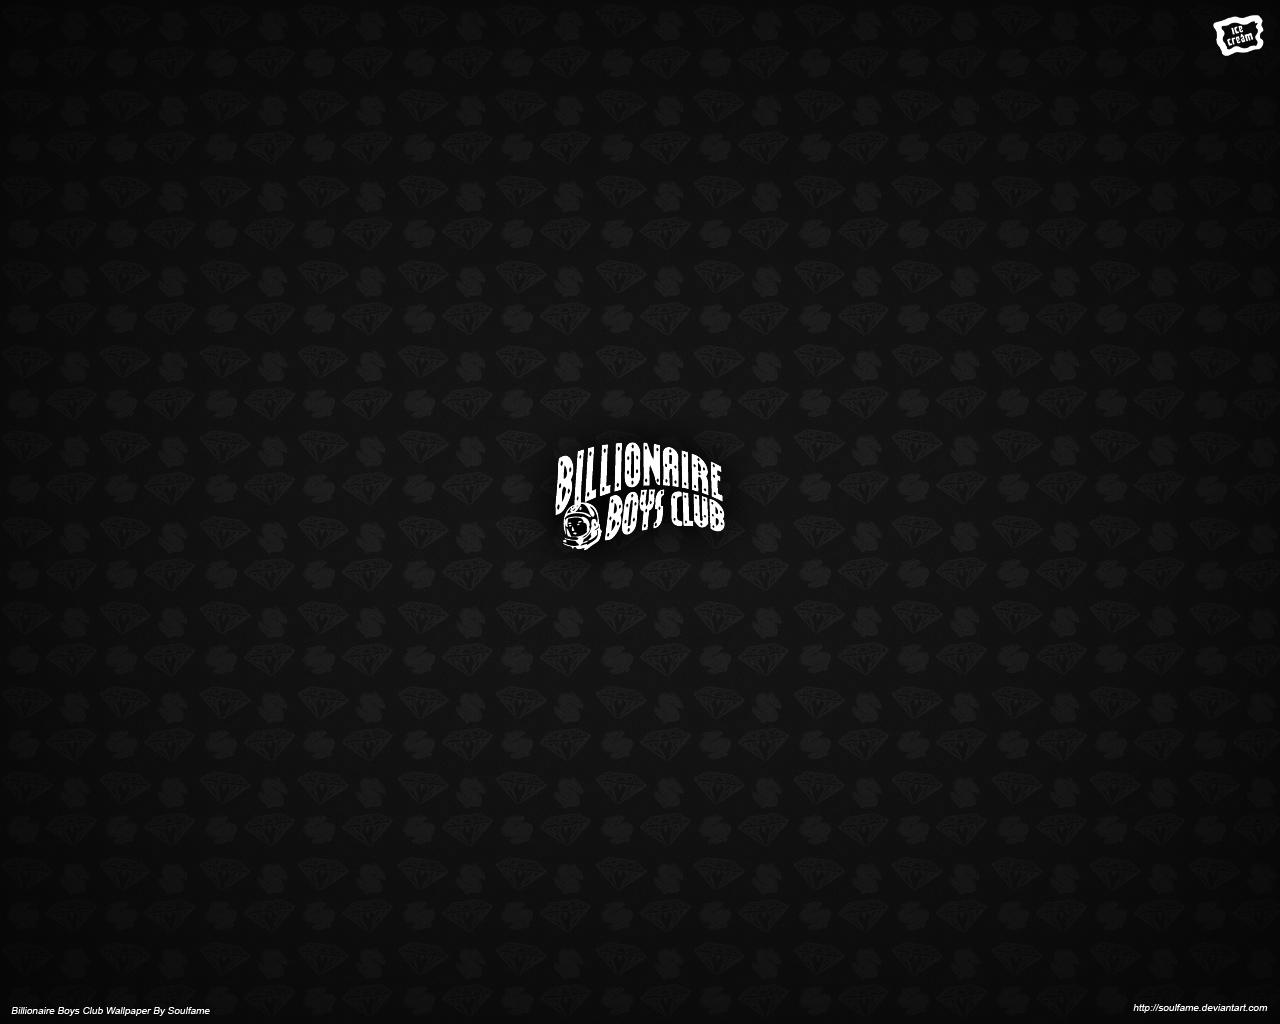 desktop wallpaper billionaire boys club wallpaper 1280x1024